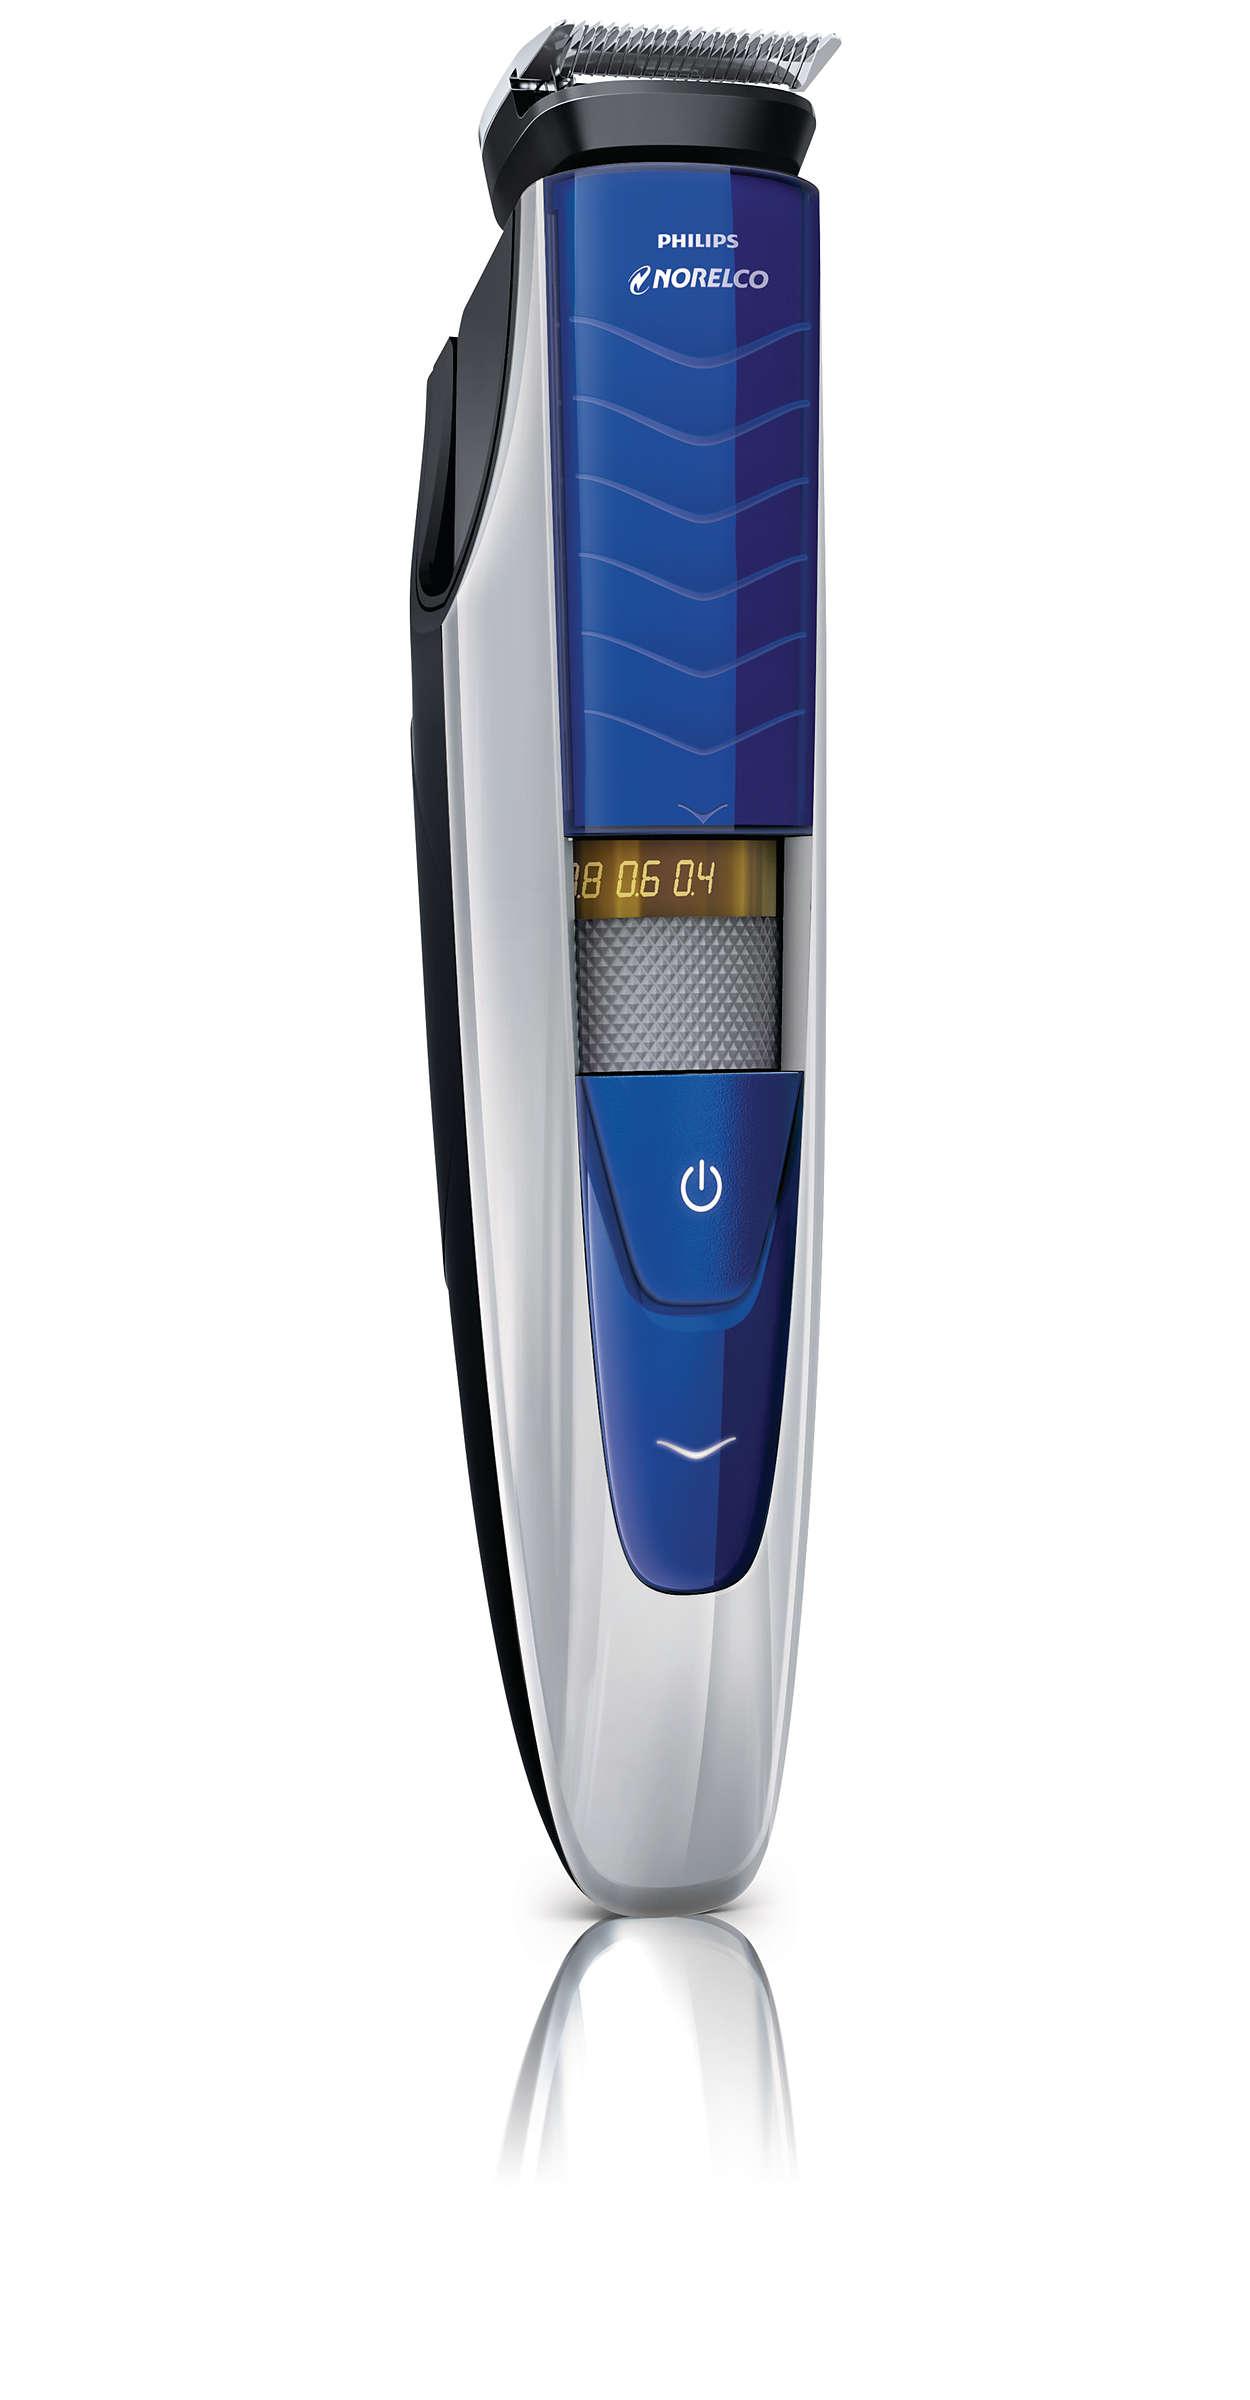 beardtrimmer 5100 wet dry beard trimmer series 5000 bt5275 41 norelco. Black Bedroom Furniture Sets. Home Design Ideas